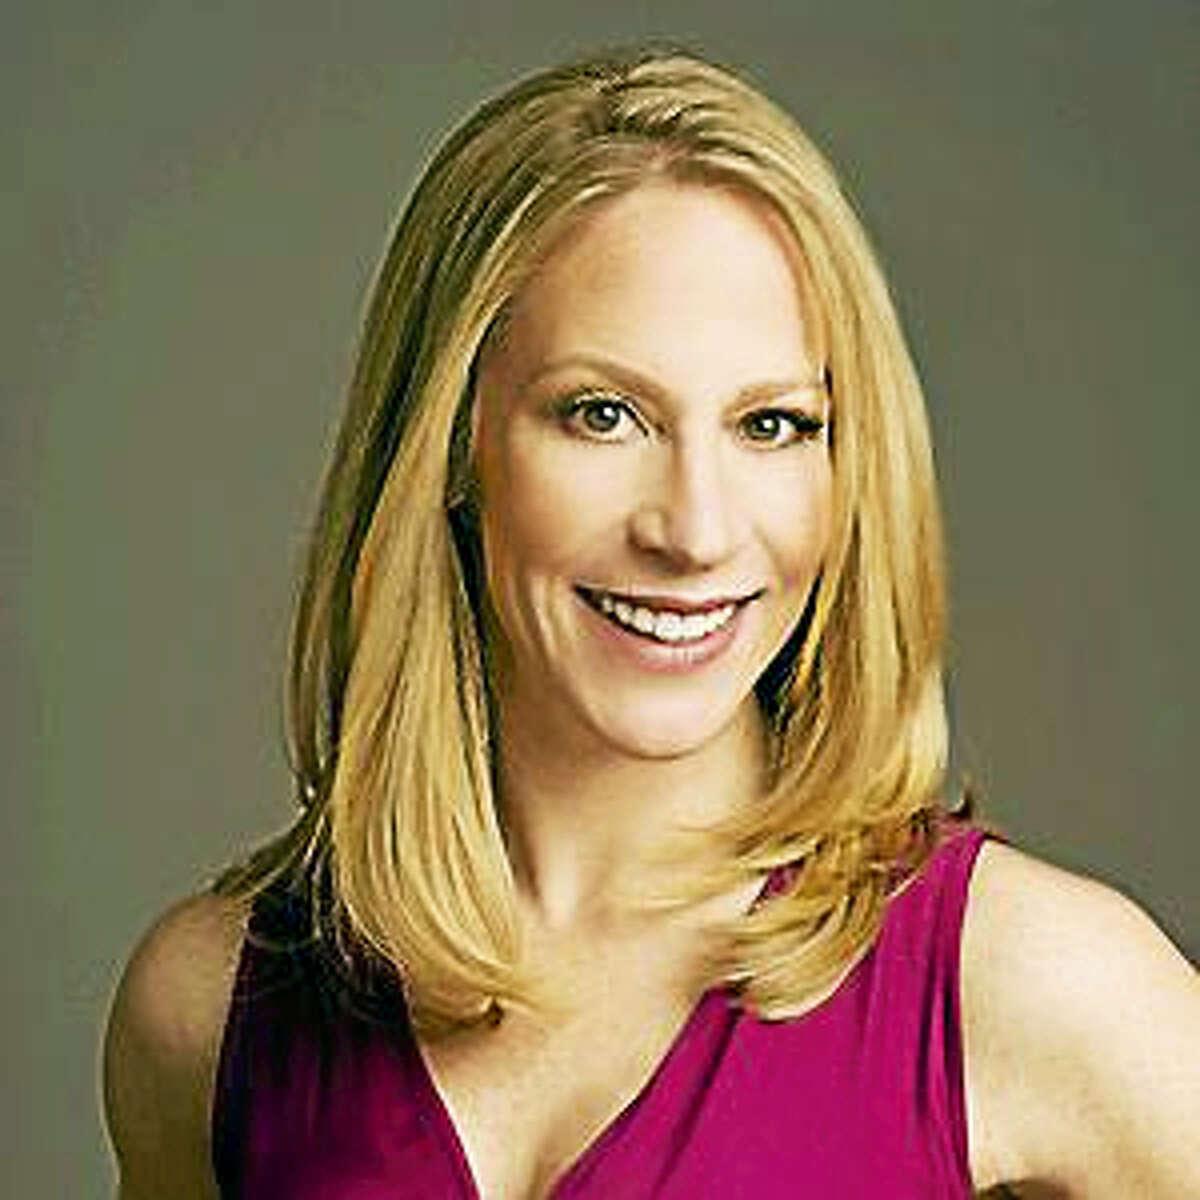 Dietician nutritionist Felicia D. Stoler